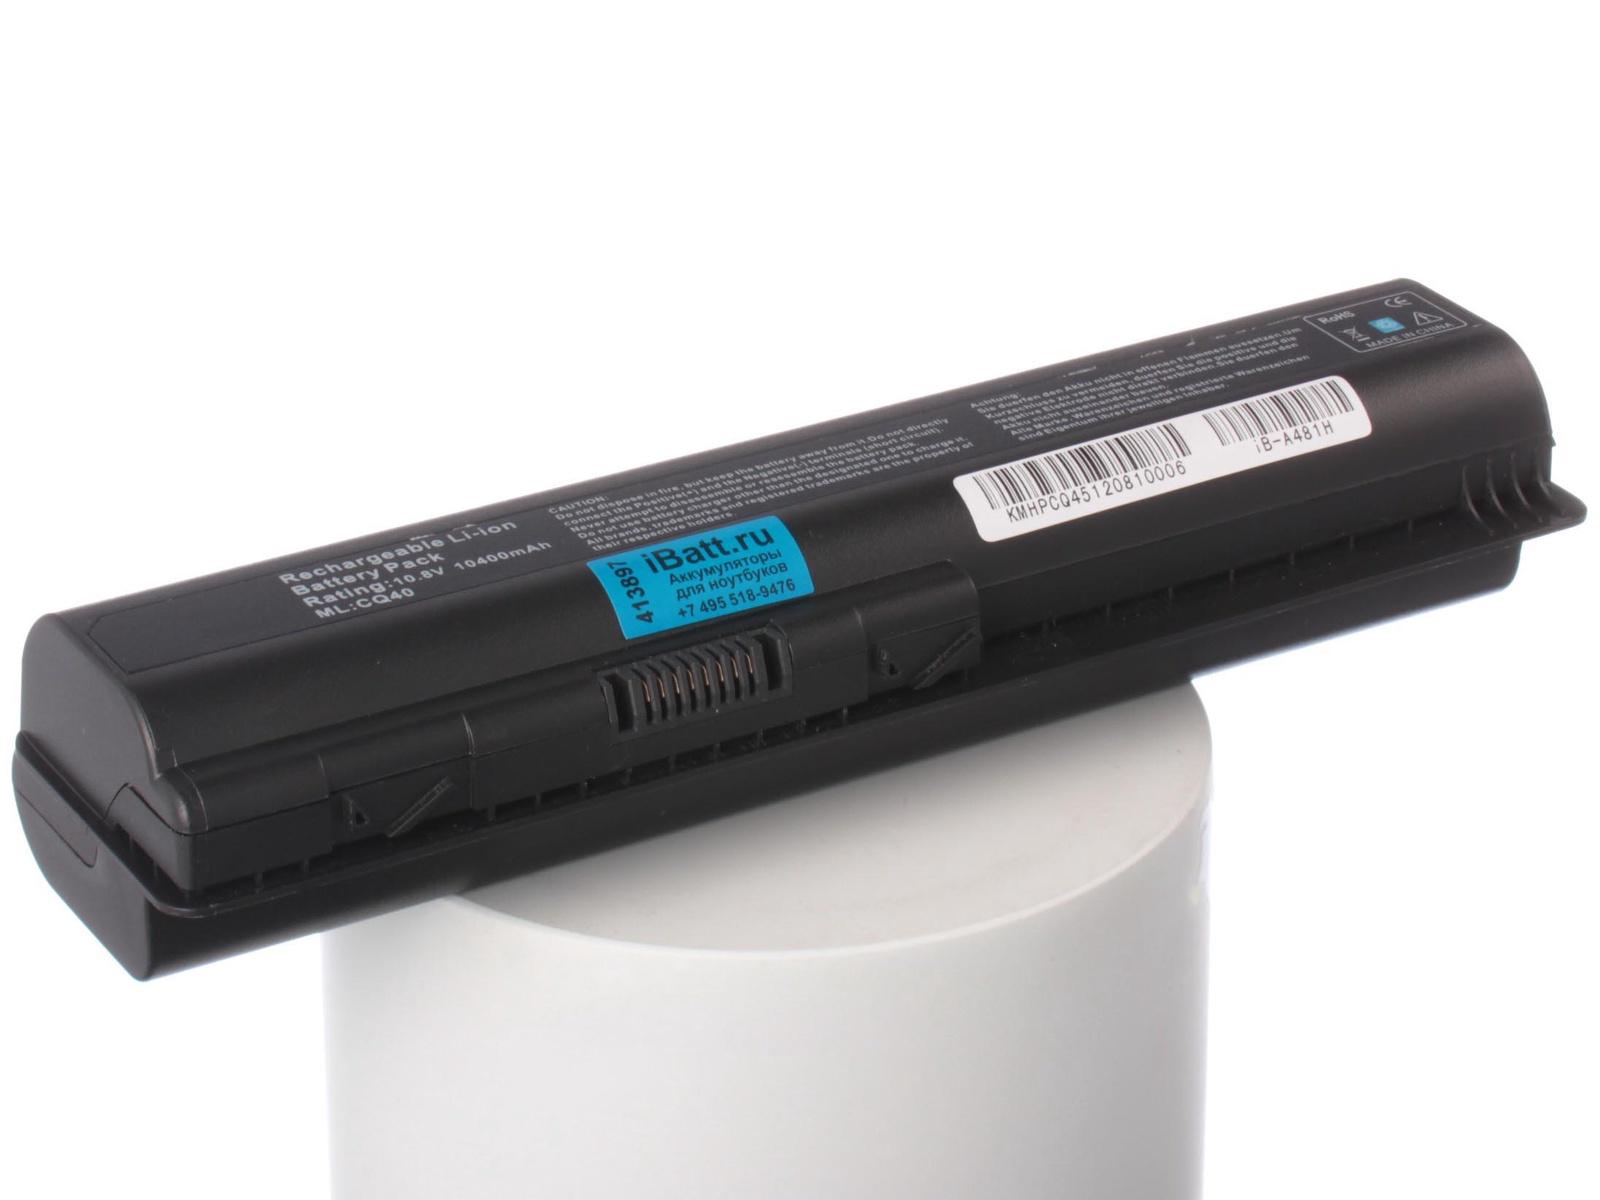 Аккумулятор для ноутбука iBatt для HP-Compaq Presario CQ61, Presario CQ60, G61, Pavilion dv6-2019ER, Presario CQ71, Presario CQ50, Pavilion dv6-2112er, Pavilion dv6-1323er, Pavilion dv5-1164er, Pavilion dv6-2116er, Presario CQ70 аккумулятор для ноутбука hp compaq hstnn lb12 hstnn ib12 hstnn c02c hstnn ub12 hstnn ib27 nc4200 nc4400 tc4200 6cell tc4400 hstnn ib12